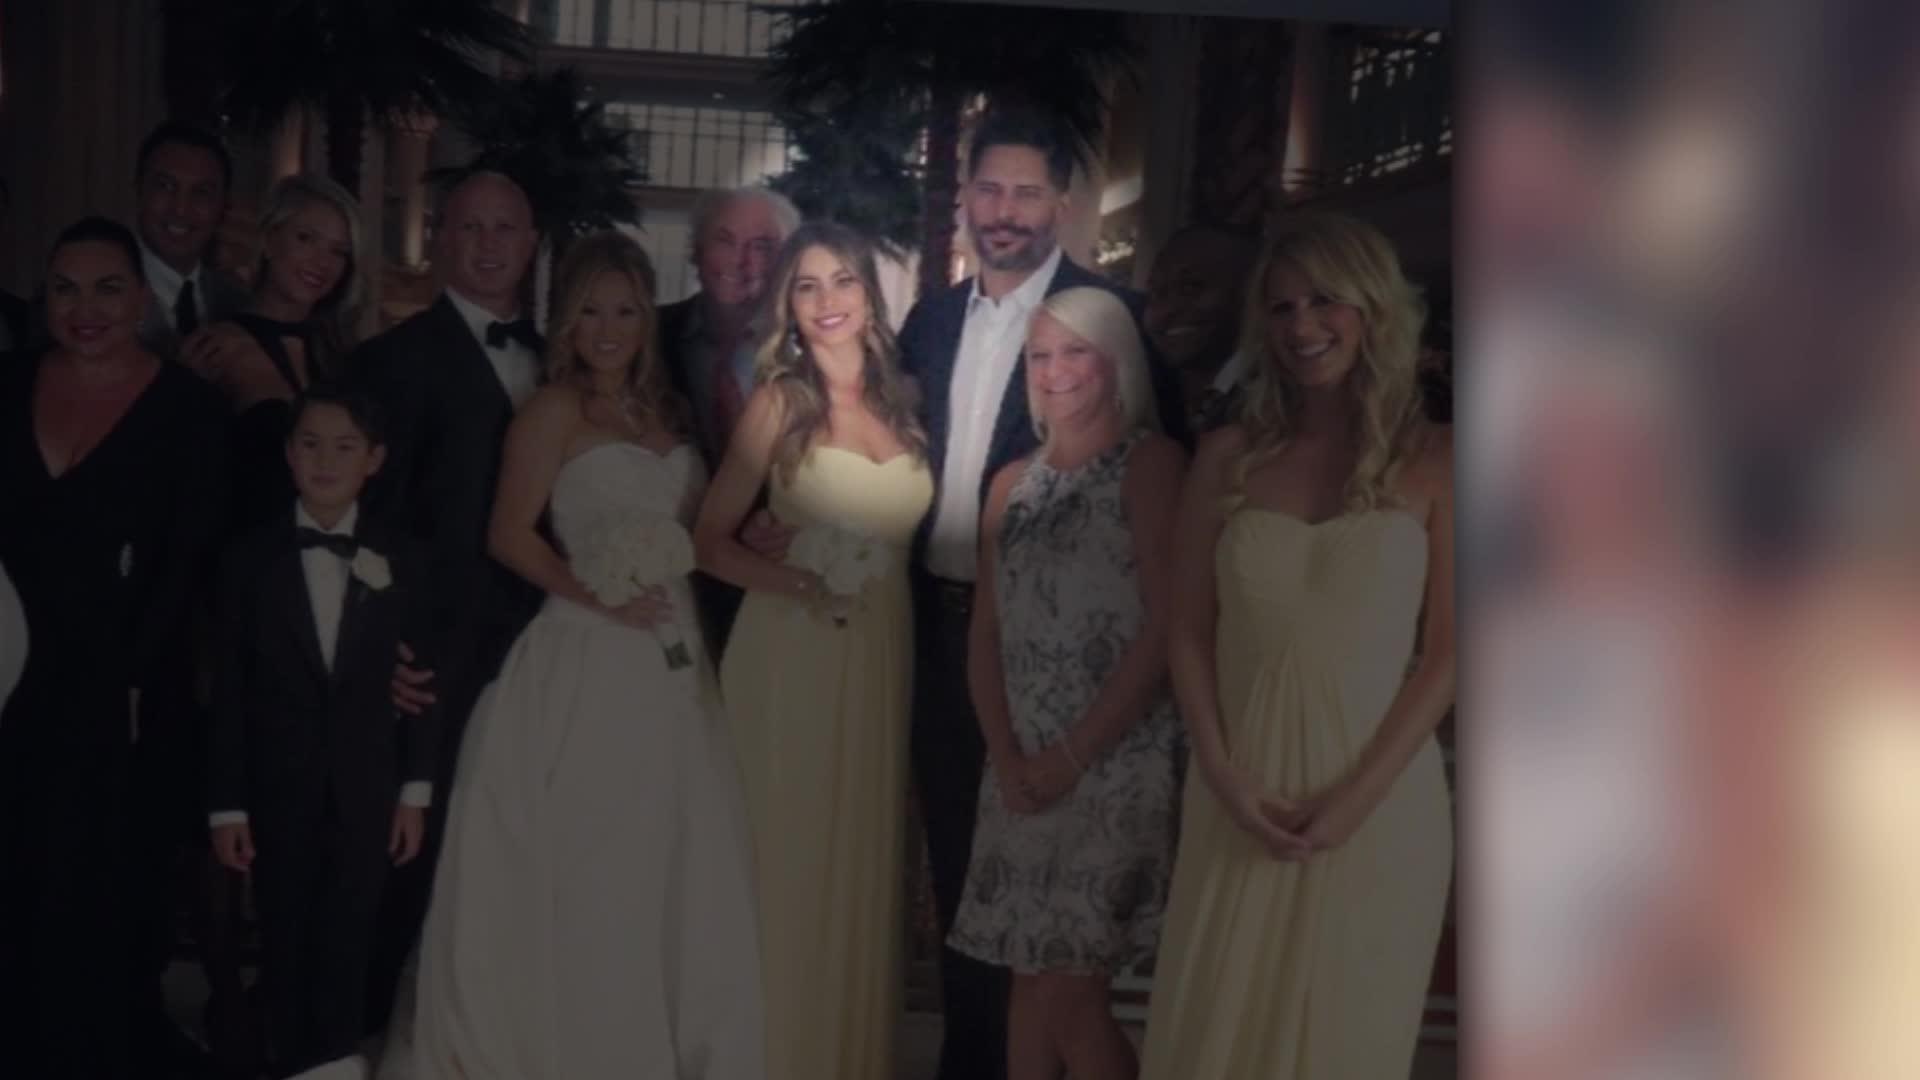 Sofia Vergara Shines as Bridesmaid Ahead of Own Wedding